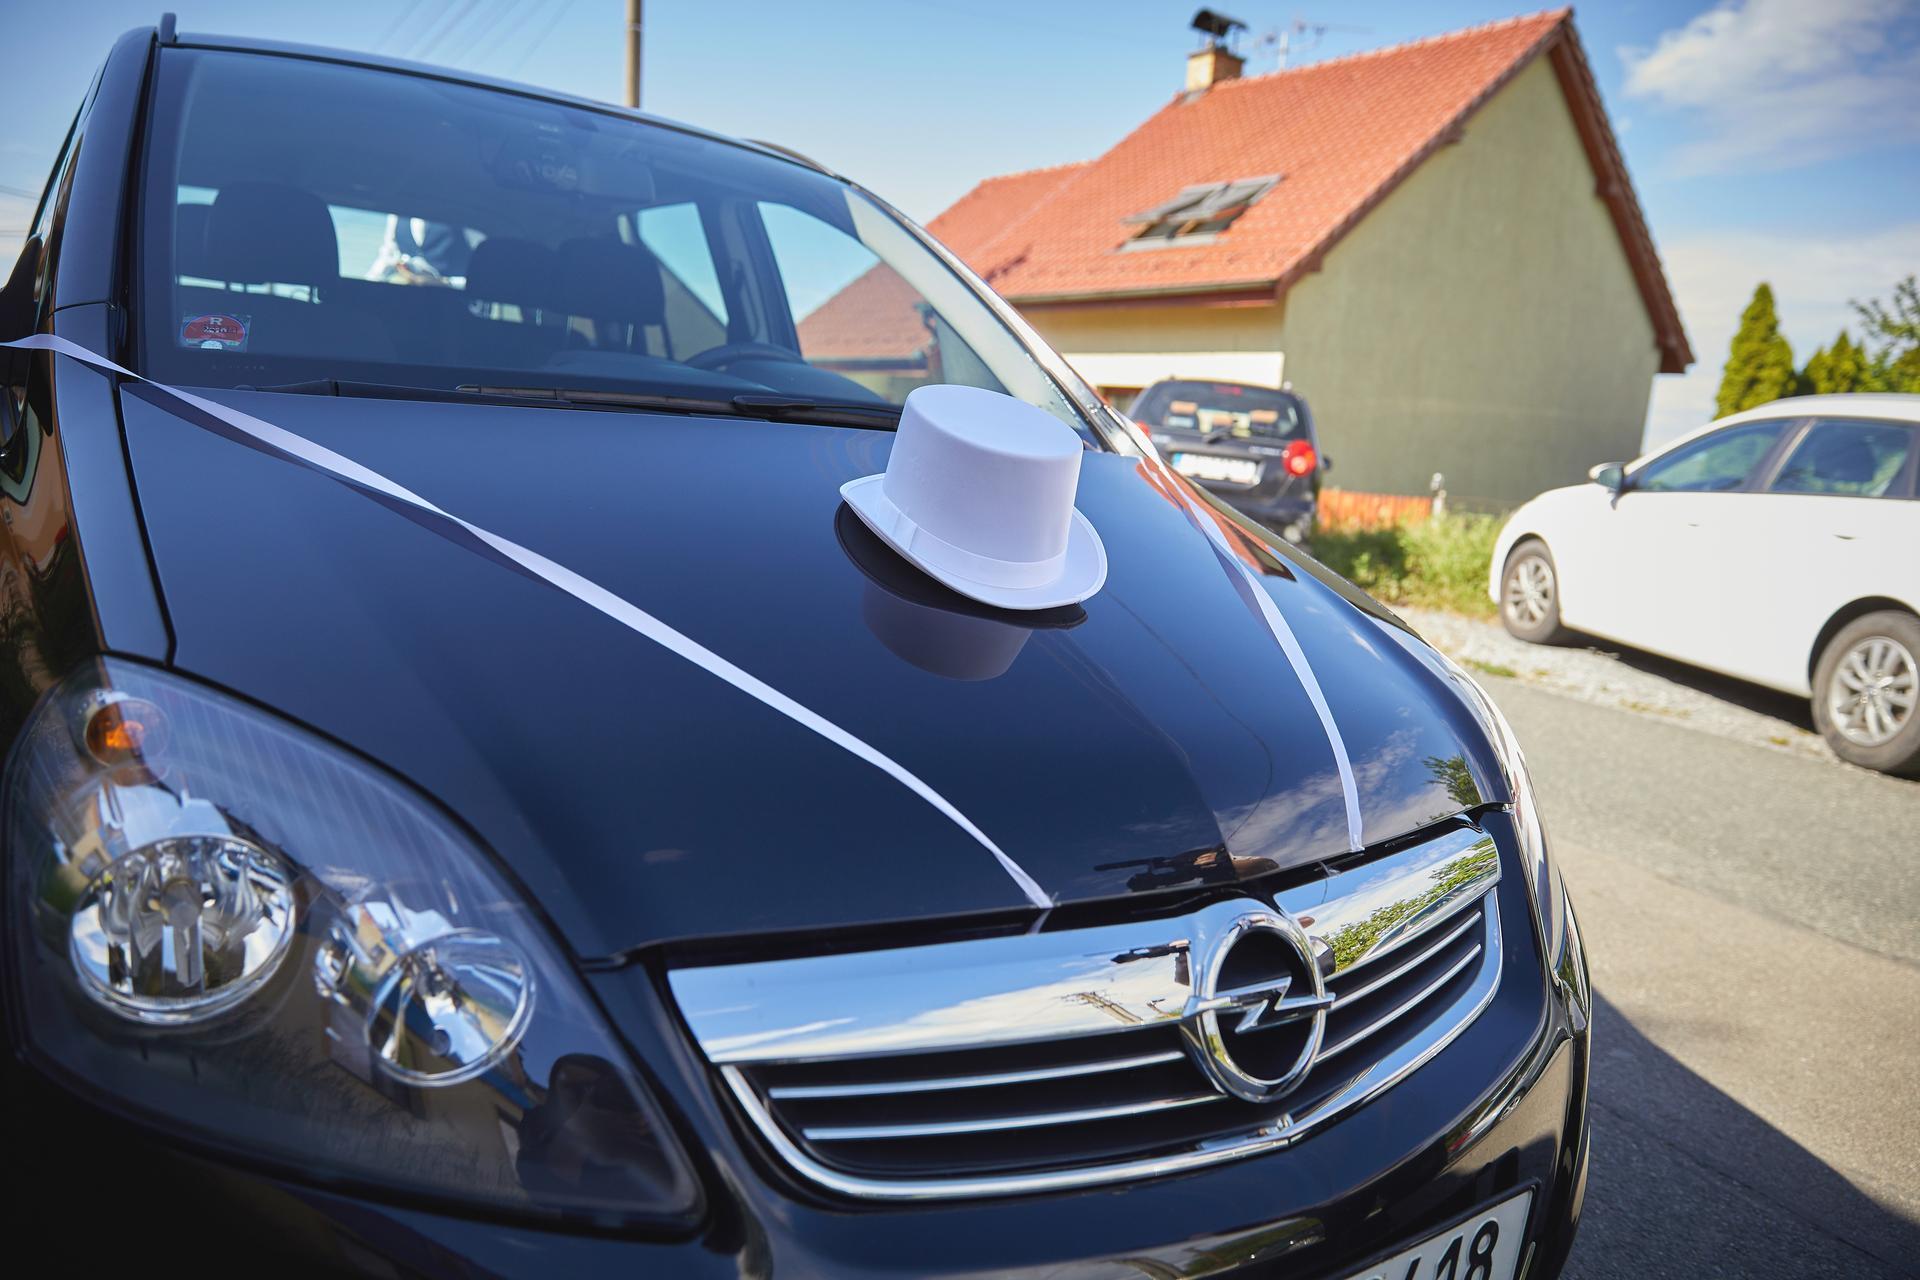 Svatba 6.6.2020 - Ženichovo auto aneb v jednoduchosti je síla.